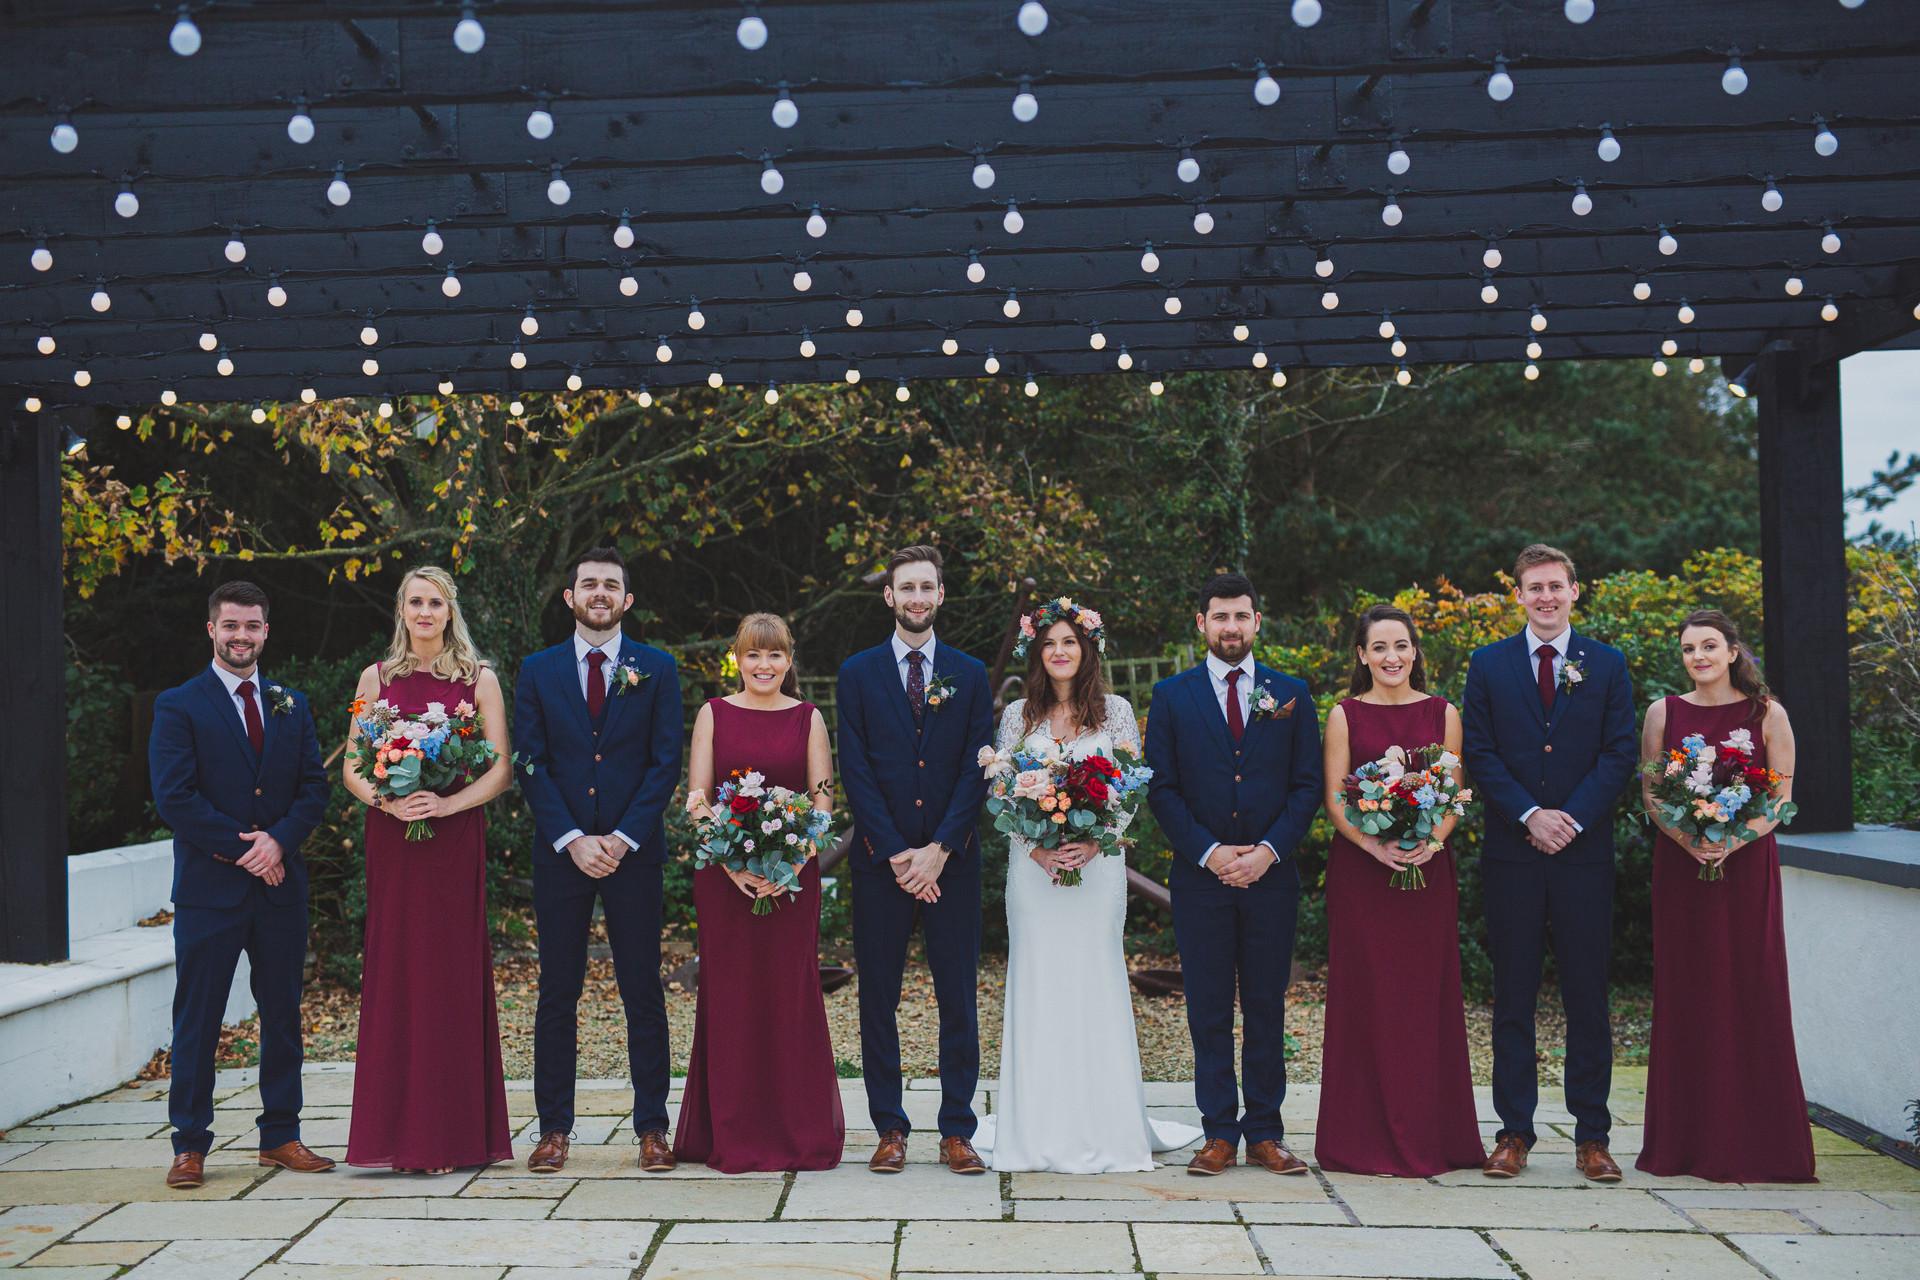 Orangetree Wedding Photos | Boho Bride | Quirky Wedding | Living Witness Weddings